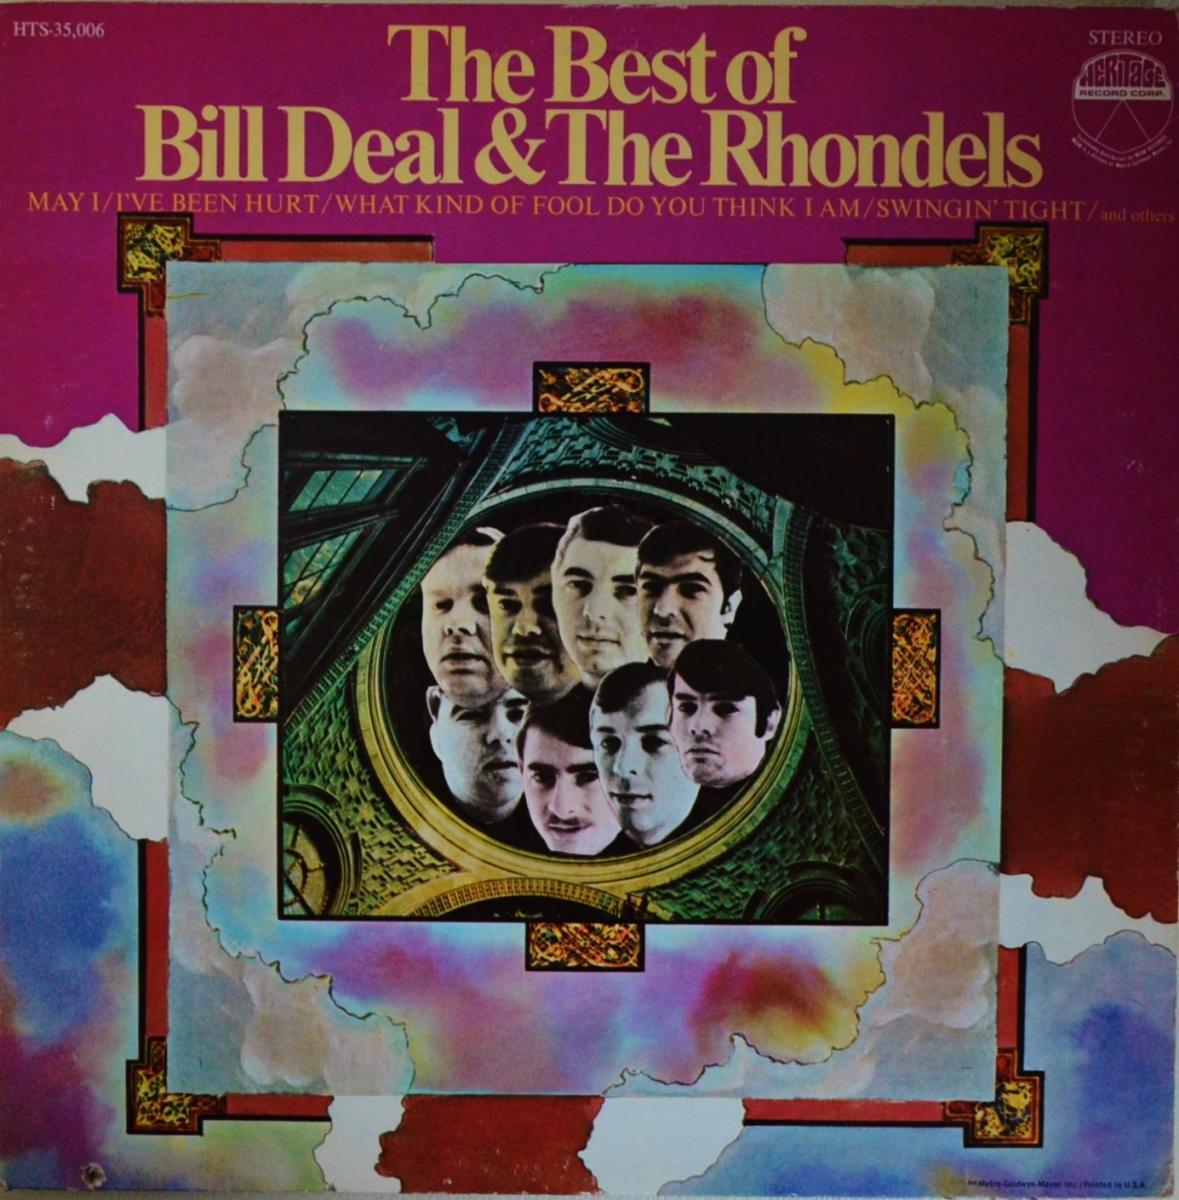 BILL DEAL & THE RHONDELS / THE BEST OF BILL DEAL & THE RHONDELS (LP)